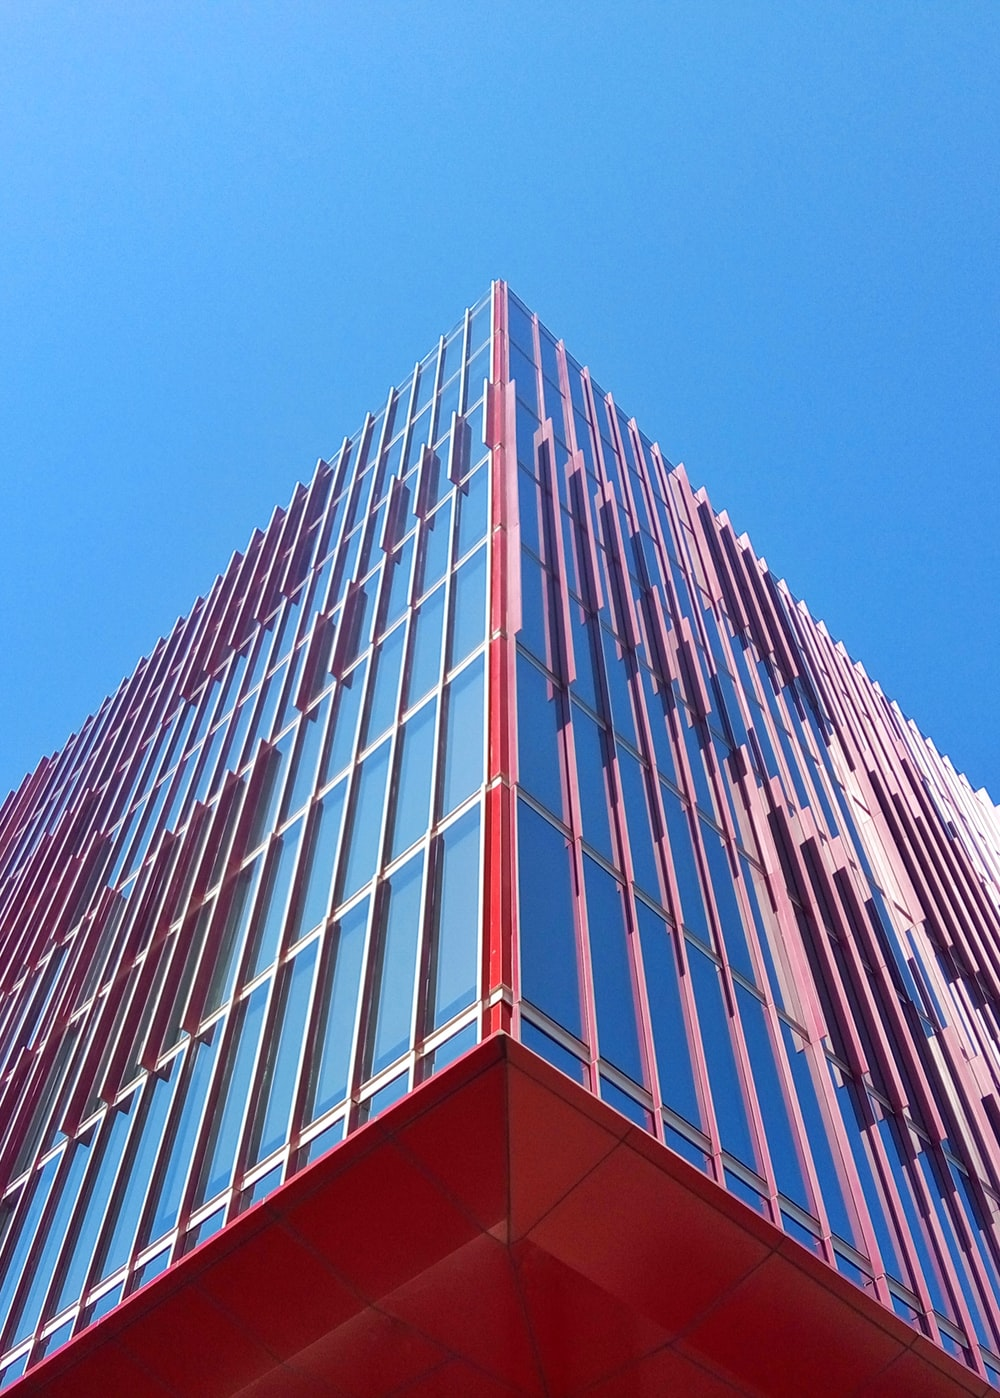 mirror building during daytime